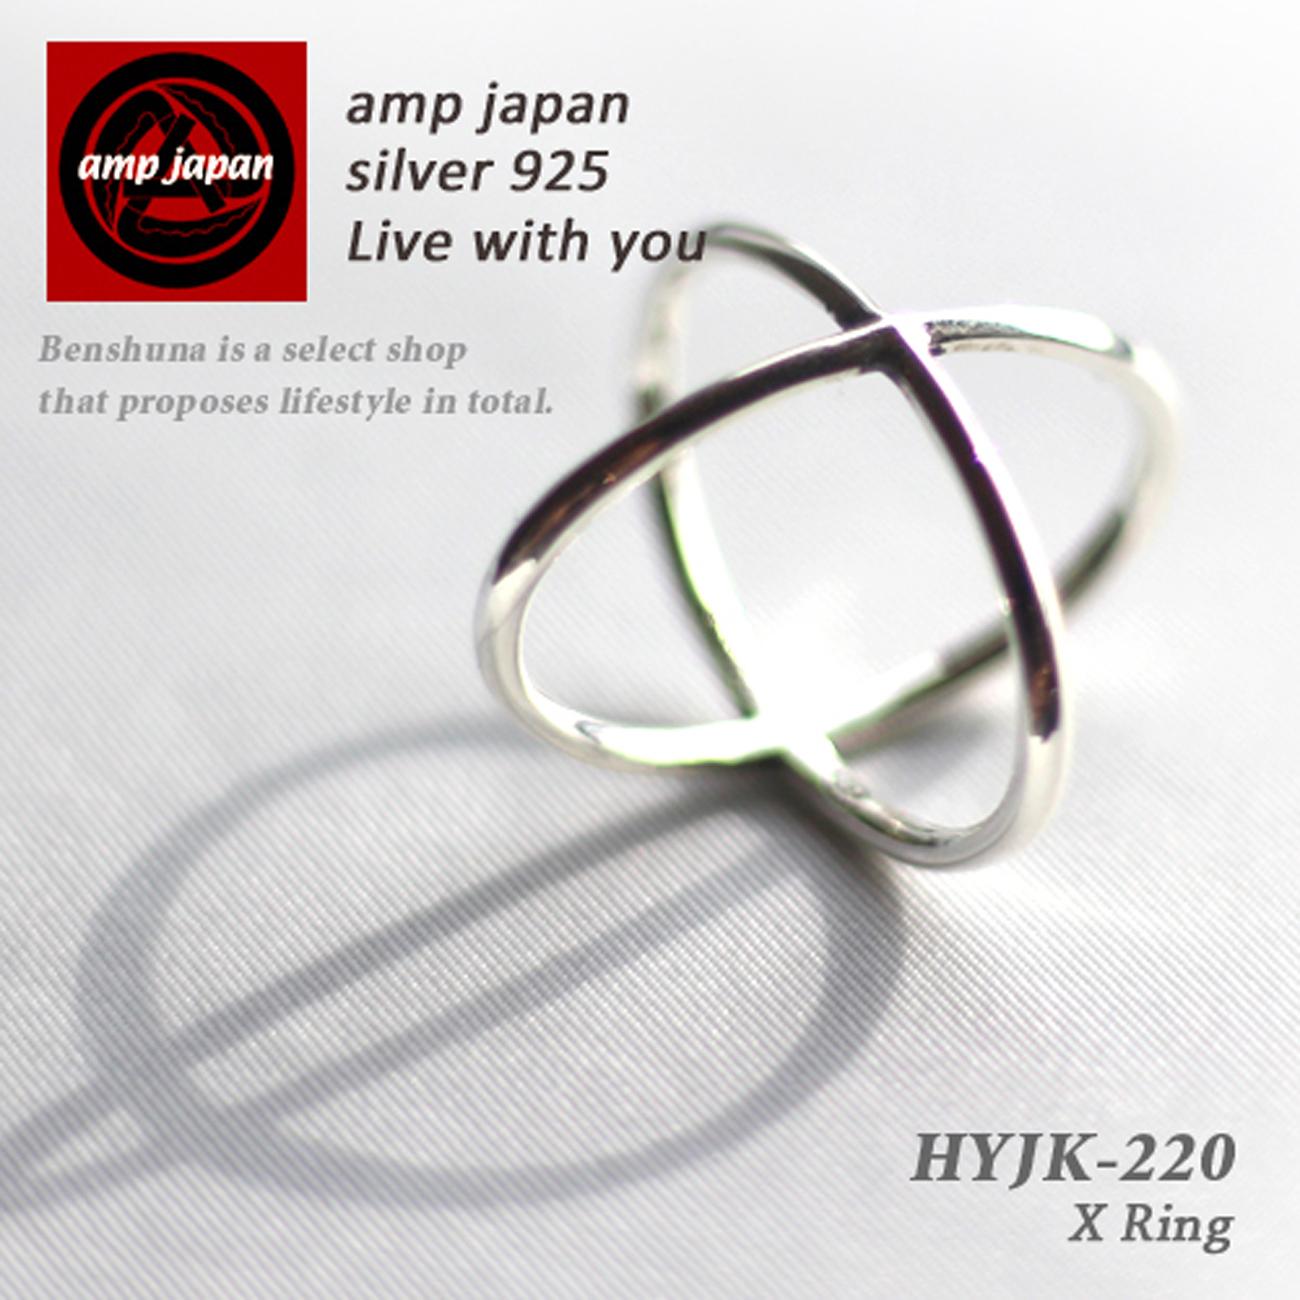 AMP JAPAN/アンプジャパン   『X Ring』  HYJK-220